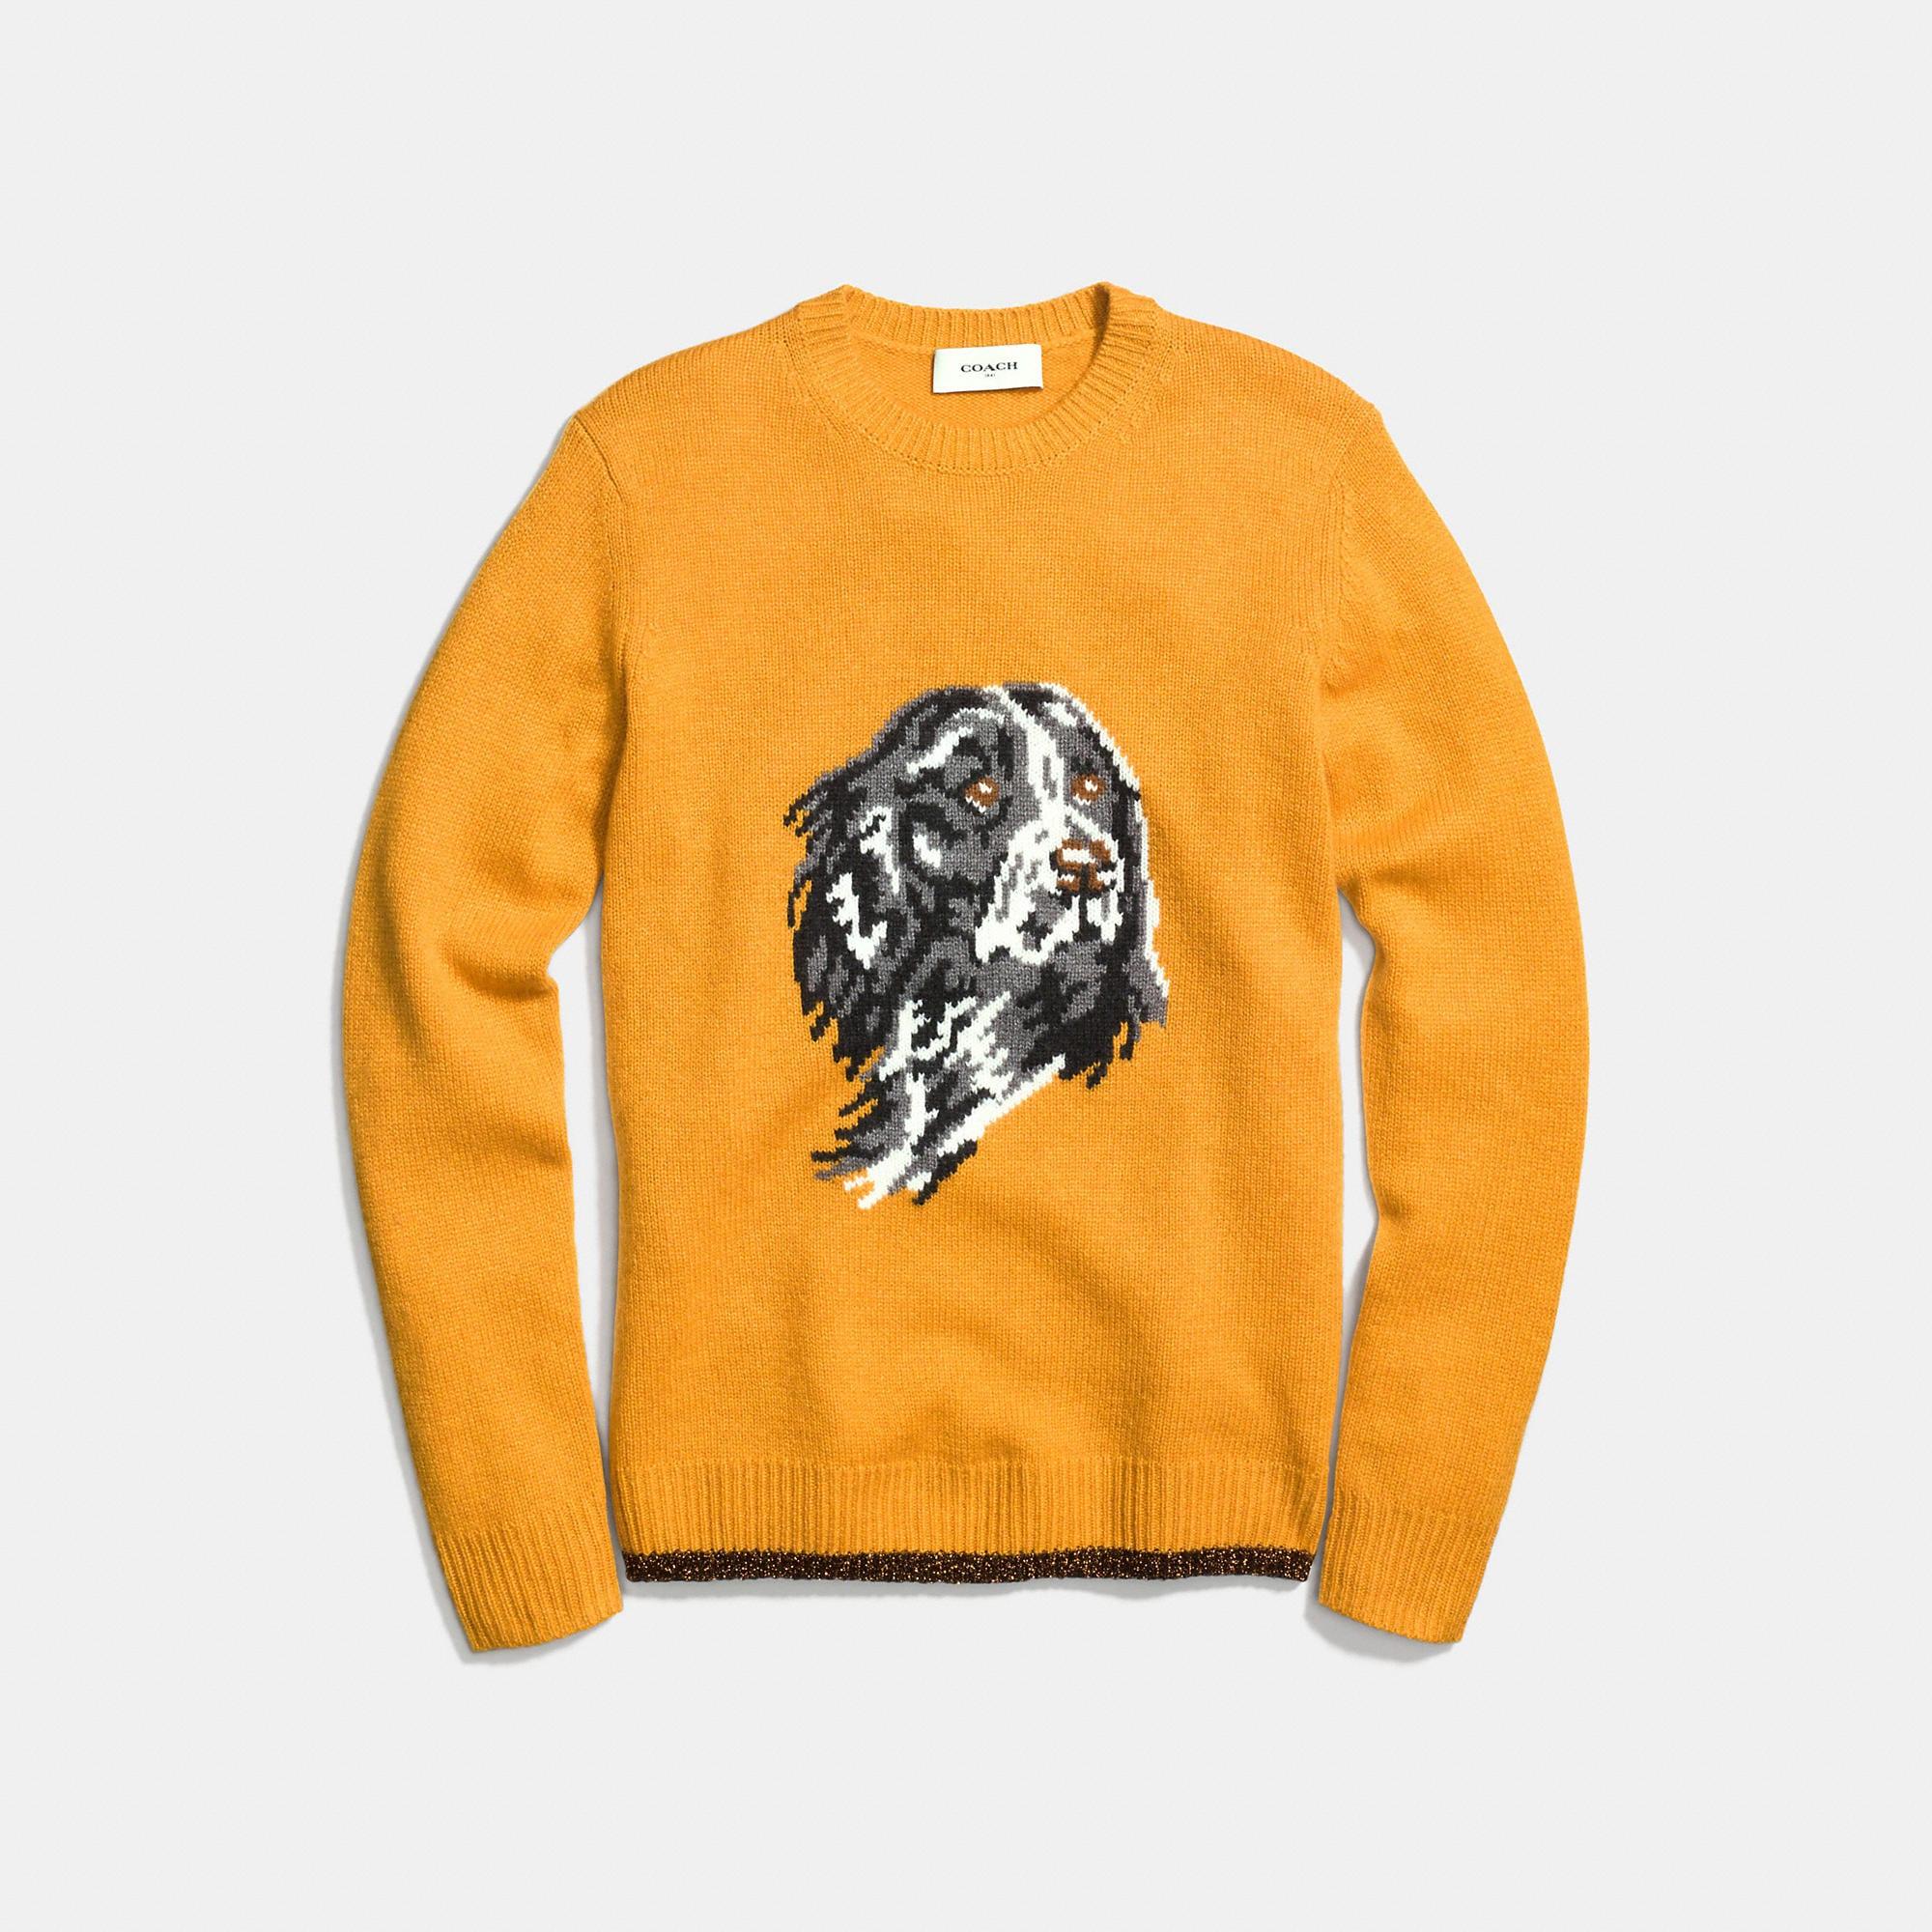 Coach Dog Intarsia Sweater